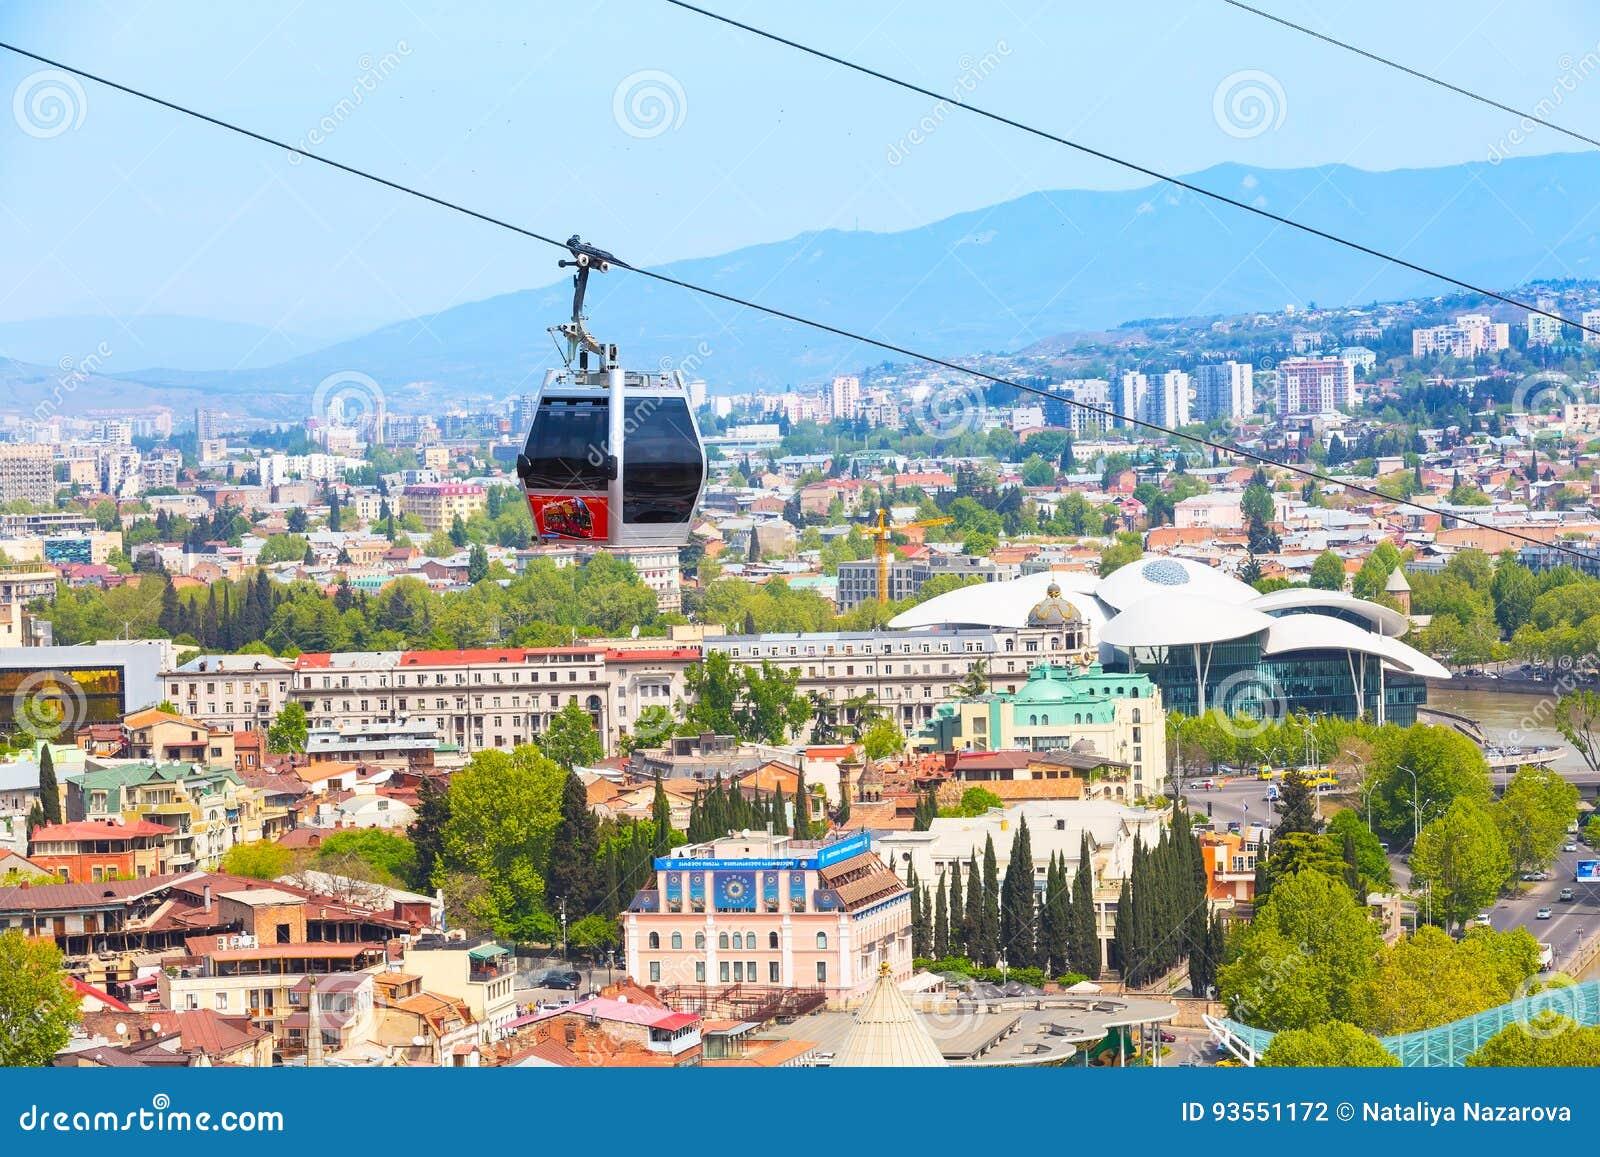 Live Videos Cars Tbilisi Georgia: Tbilisi, Georgia Cable Car Cabins And Aerial City Skyline